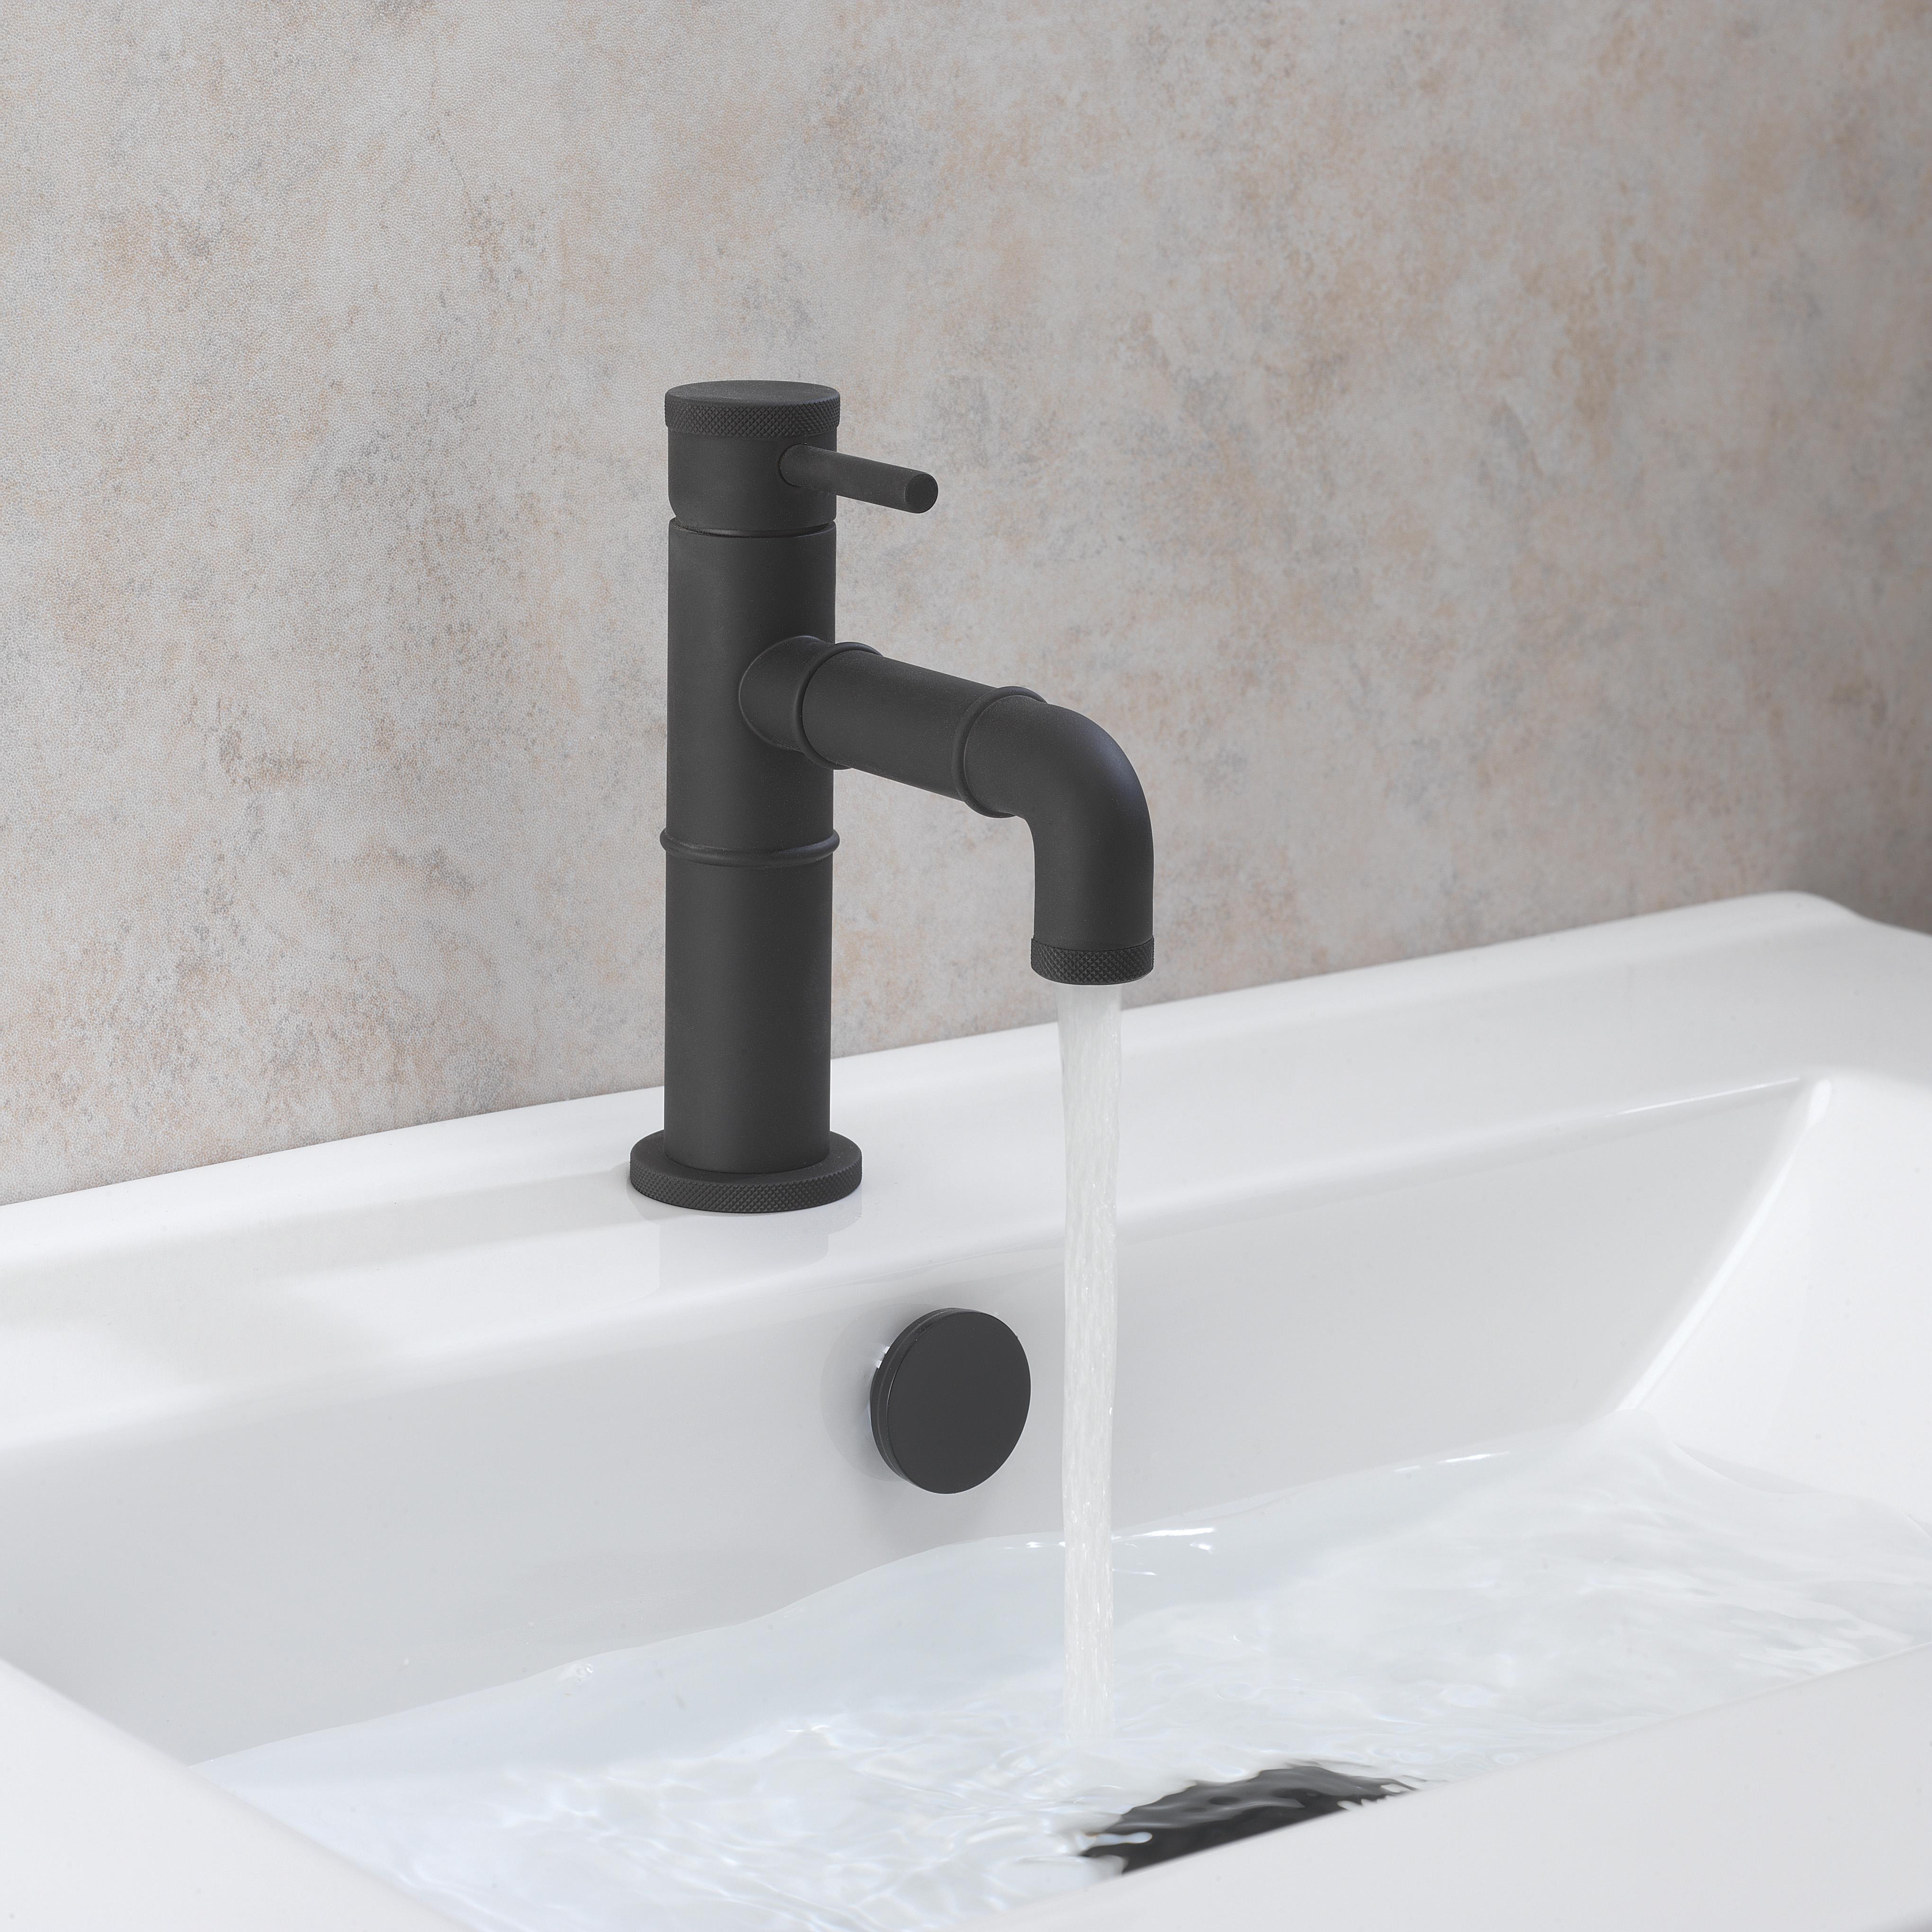 black tap fittings in plaster wall bathroom